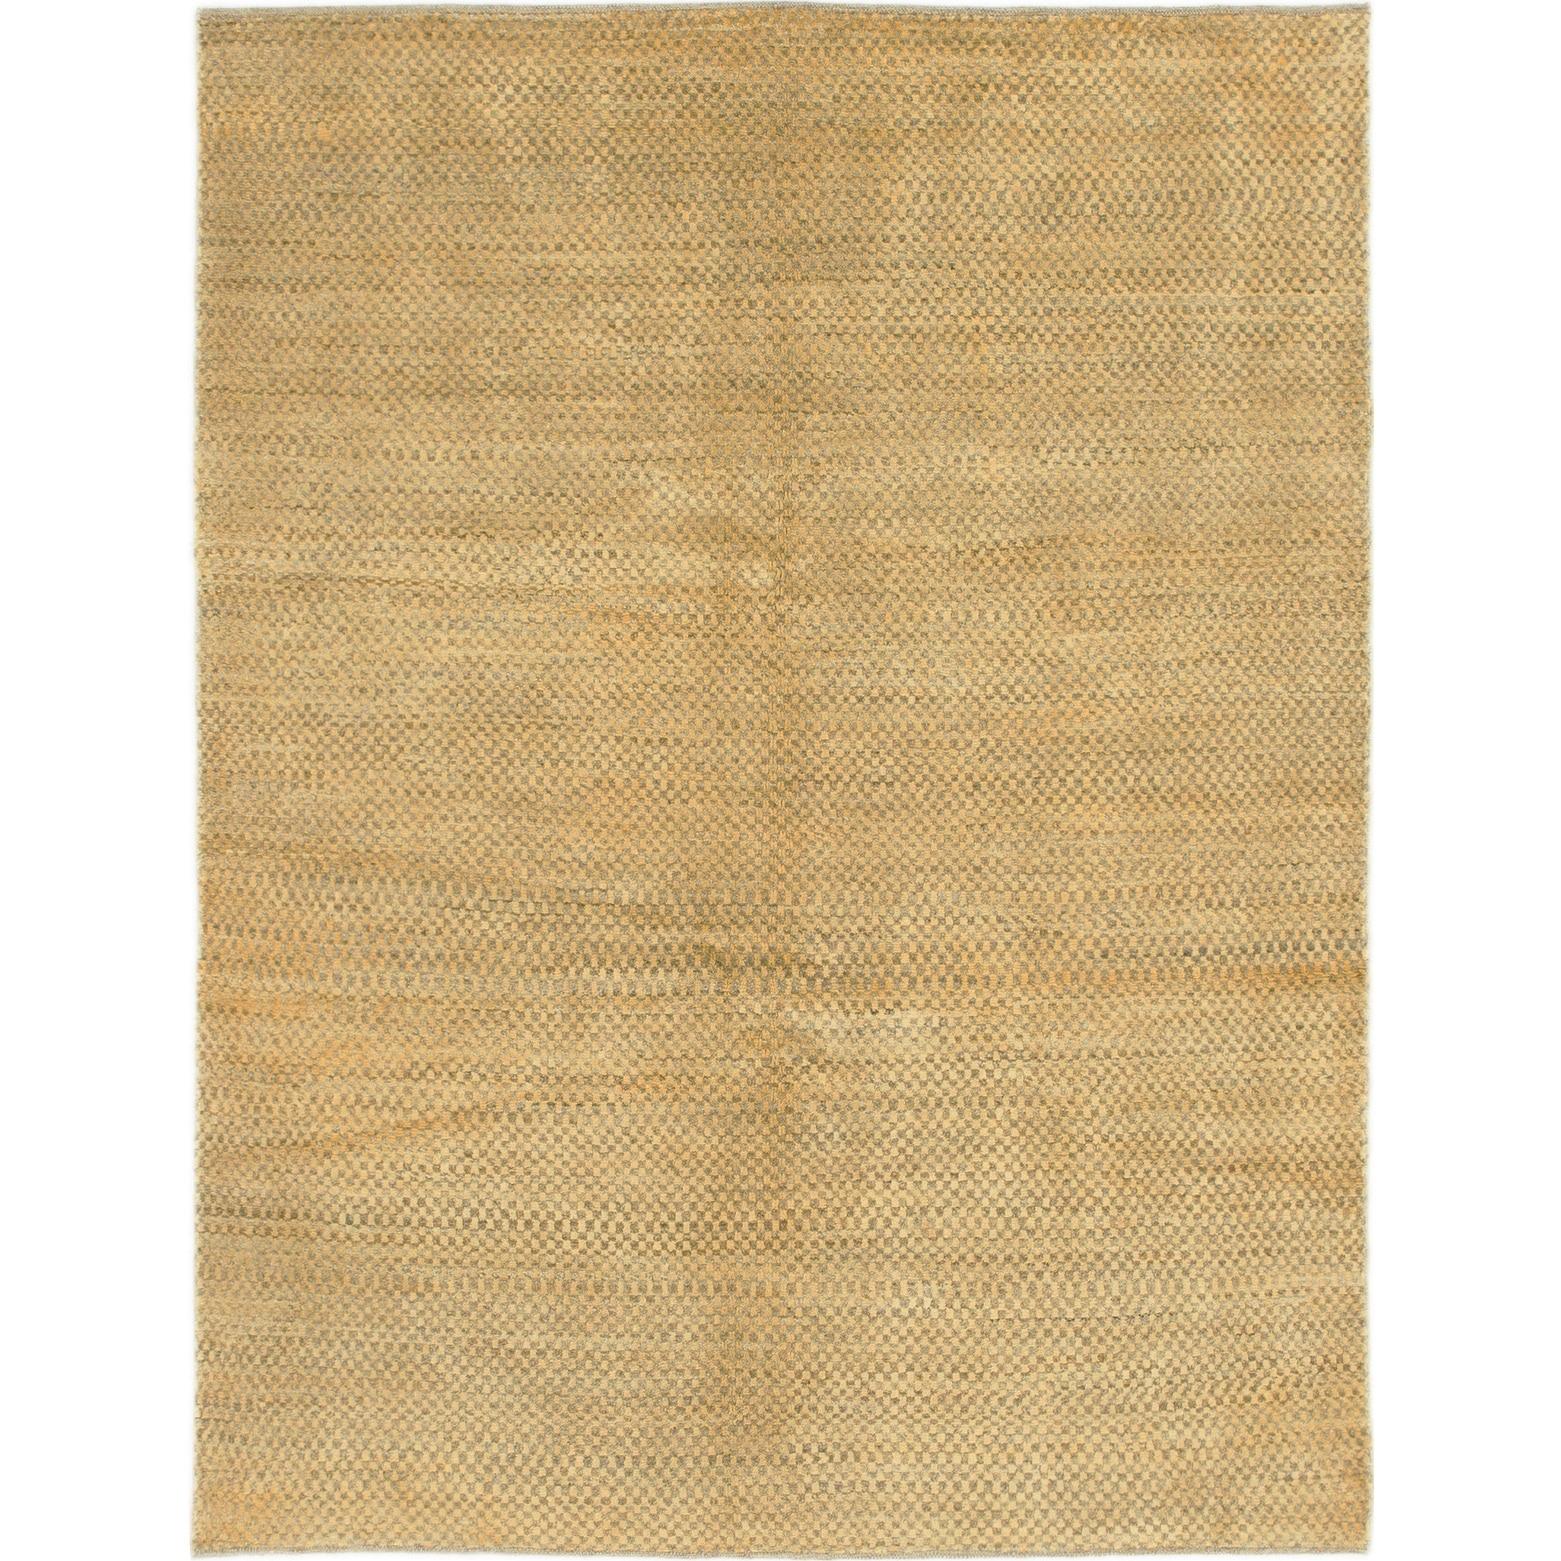 Hand Knotted Kashkuli Gabbeh Wool Area Rug - 4 7 x 6 (Gold - 4 7 x 6)